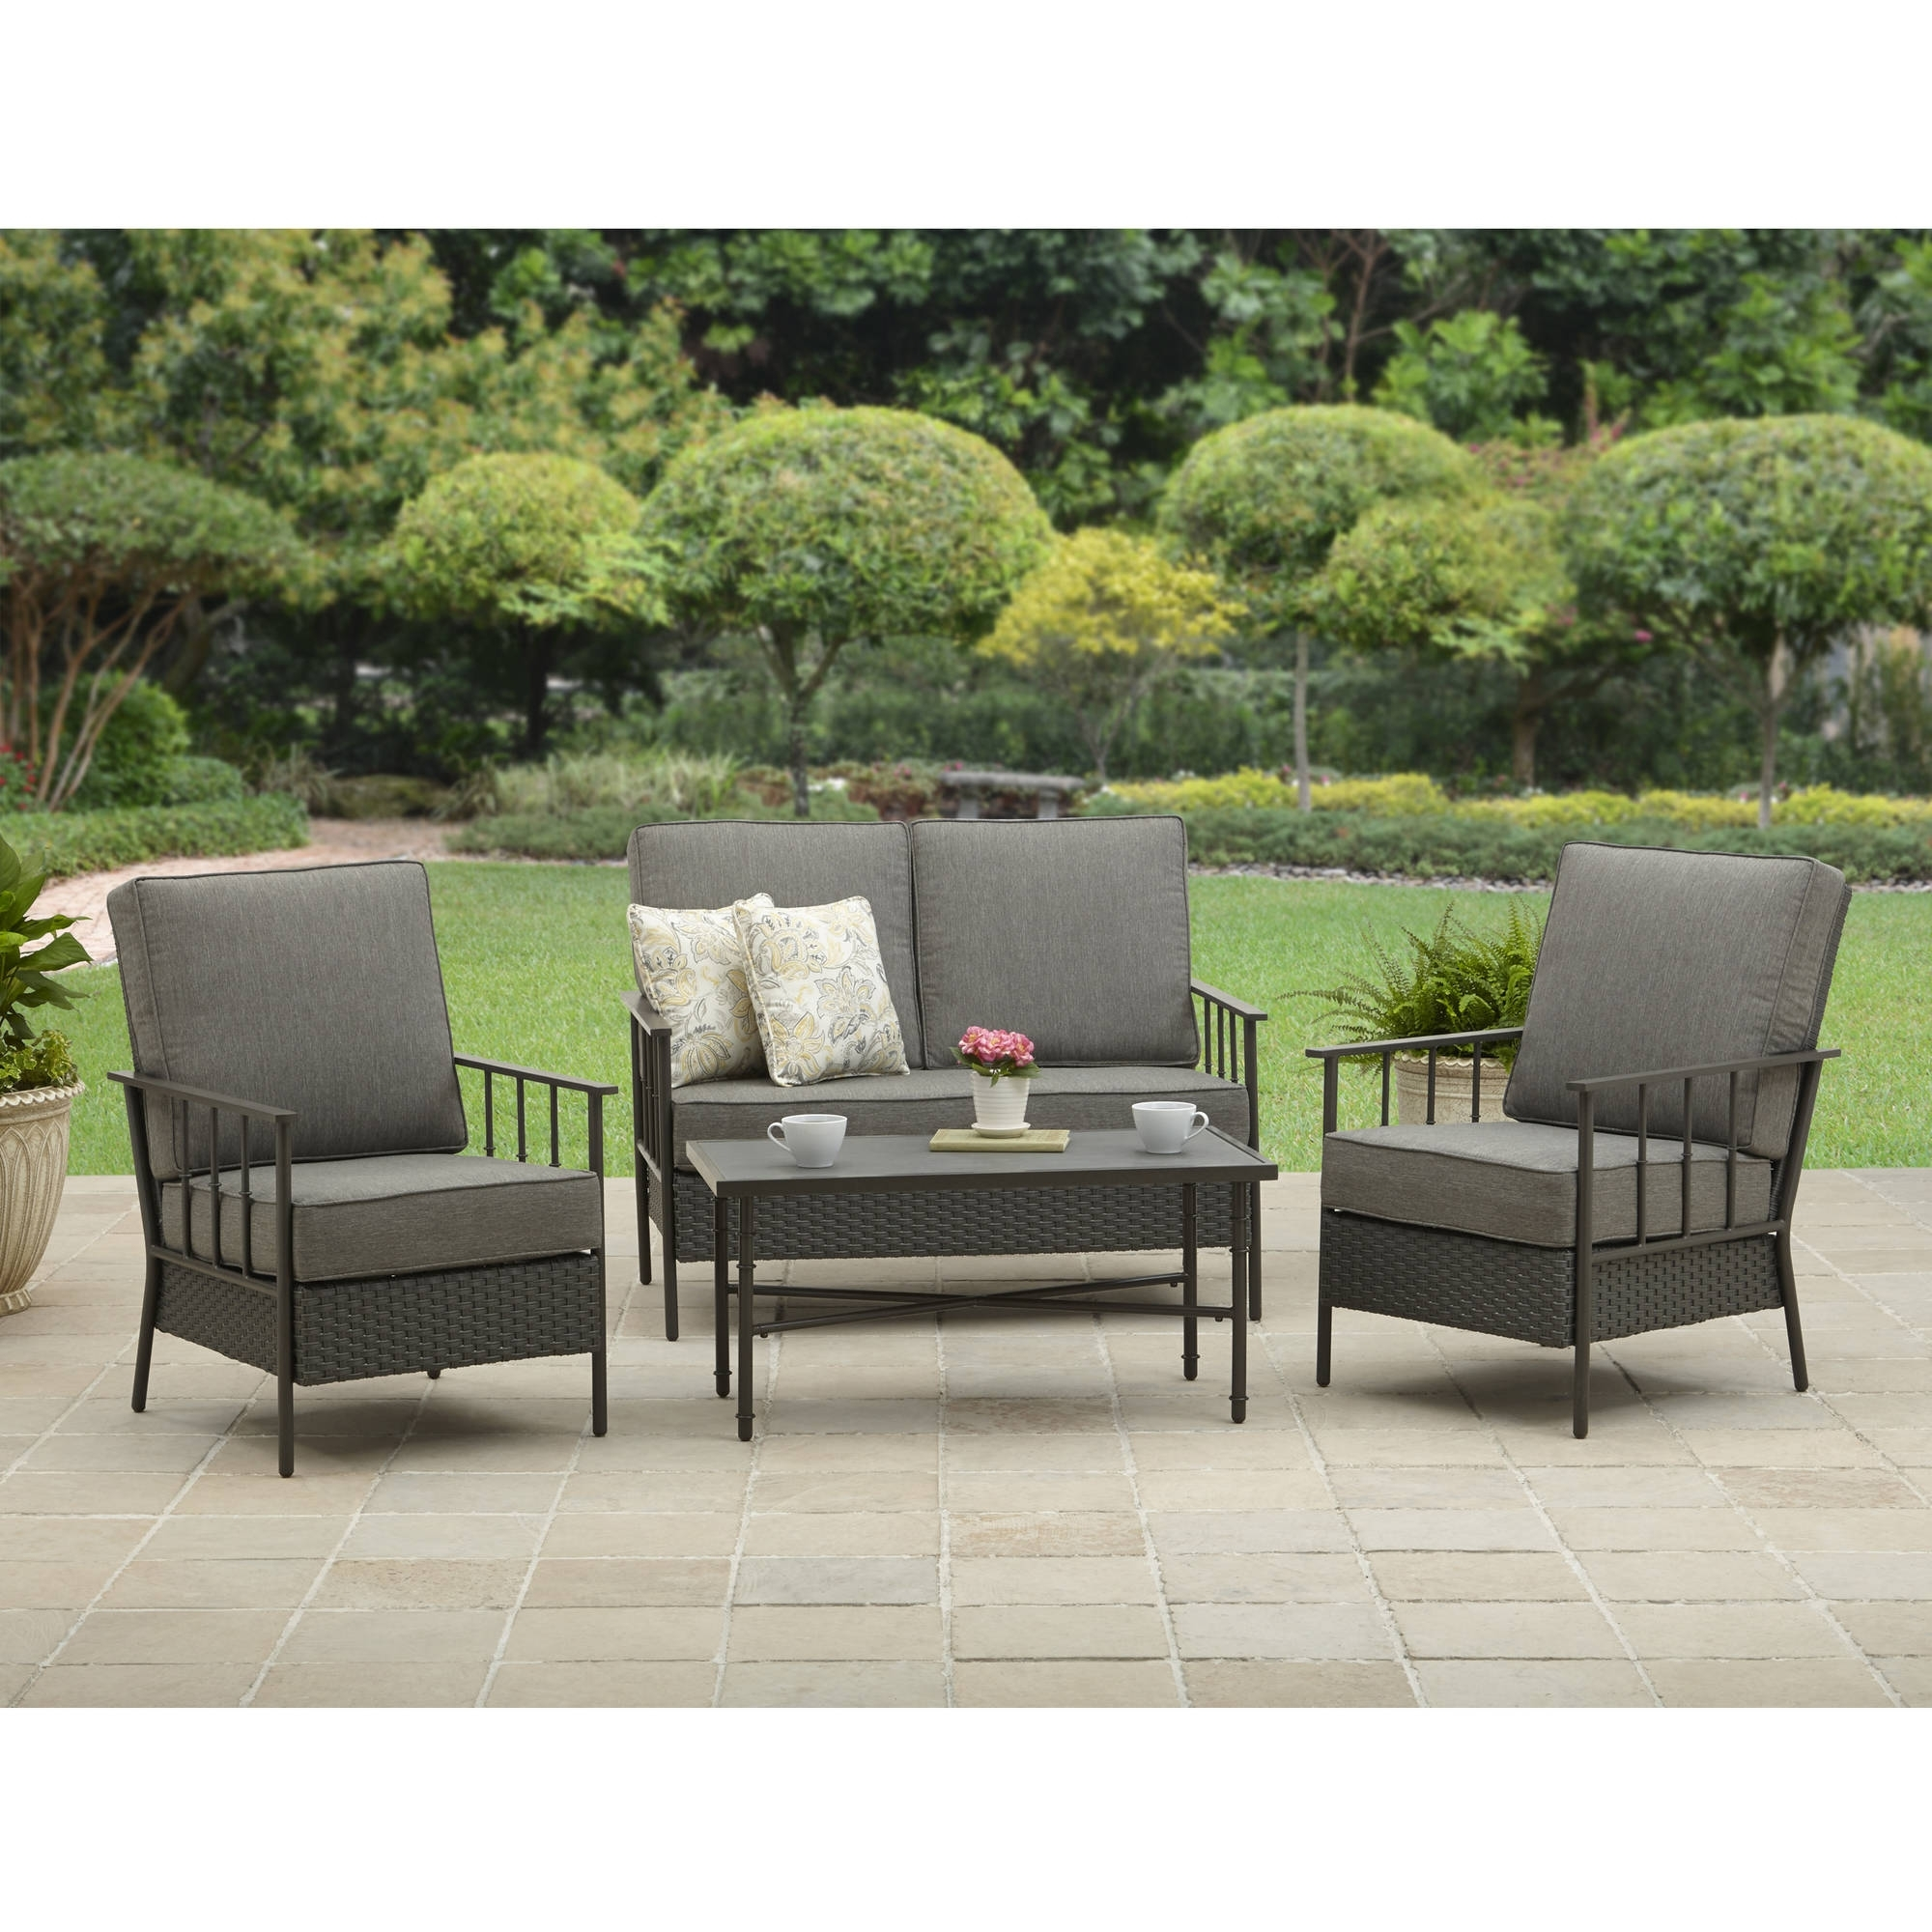 Most Current Better Homes And Garden Fairwater 4 Piece Outdoor Conversation Set Within Walmart Patio Furniture Conversation Sets (View 10 of 15)